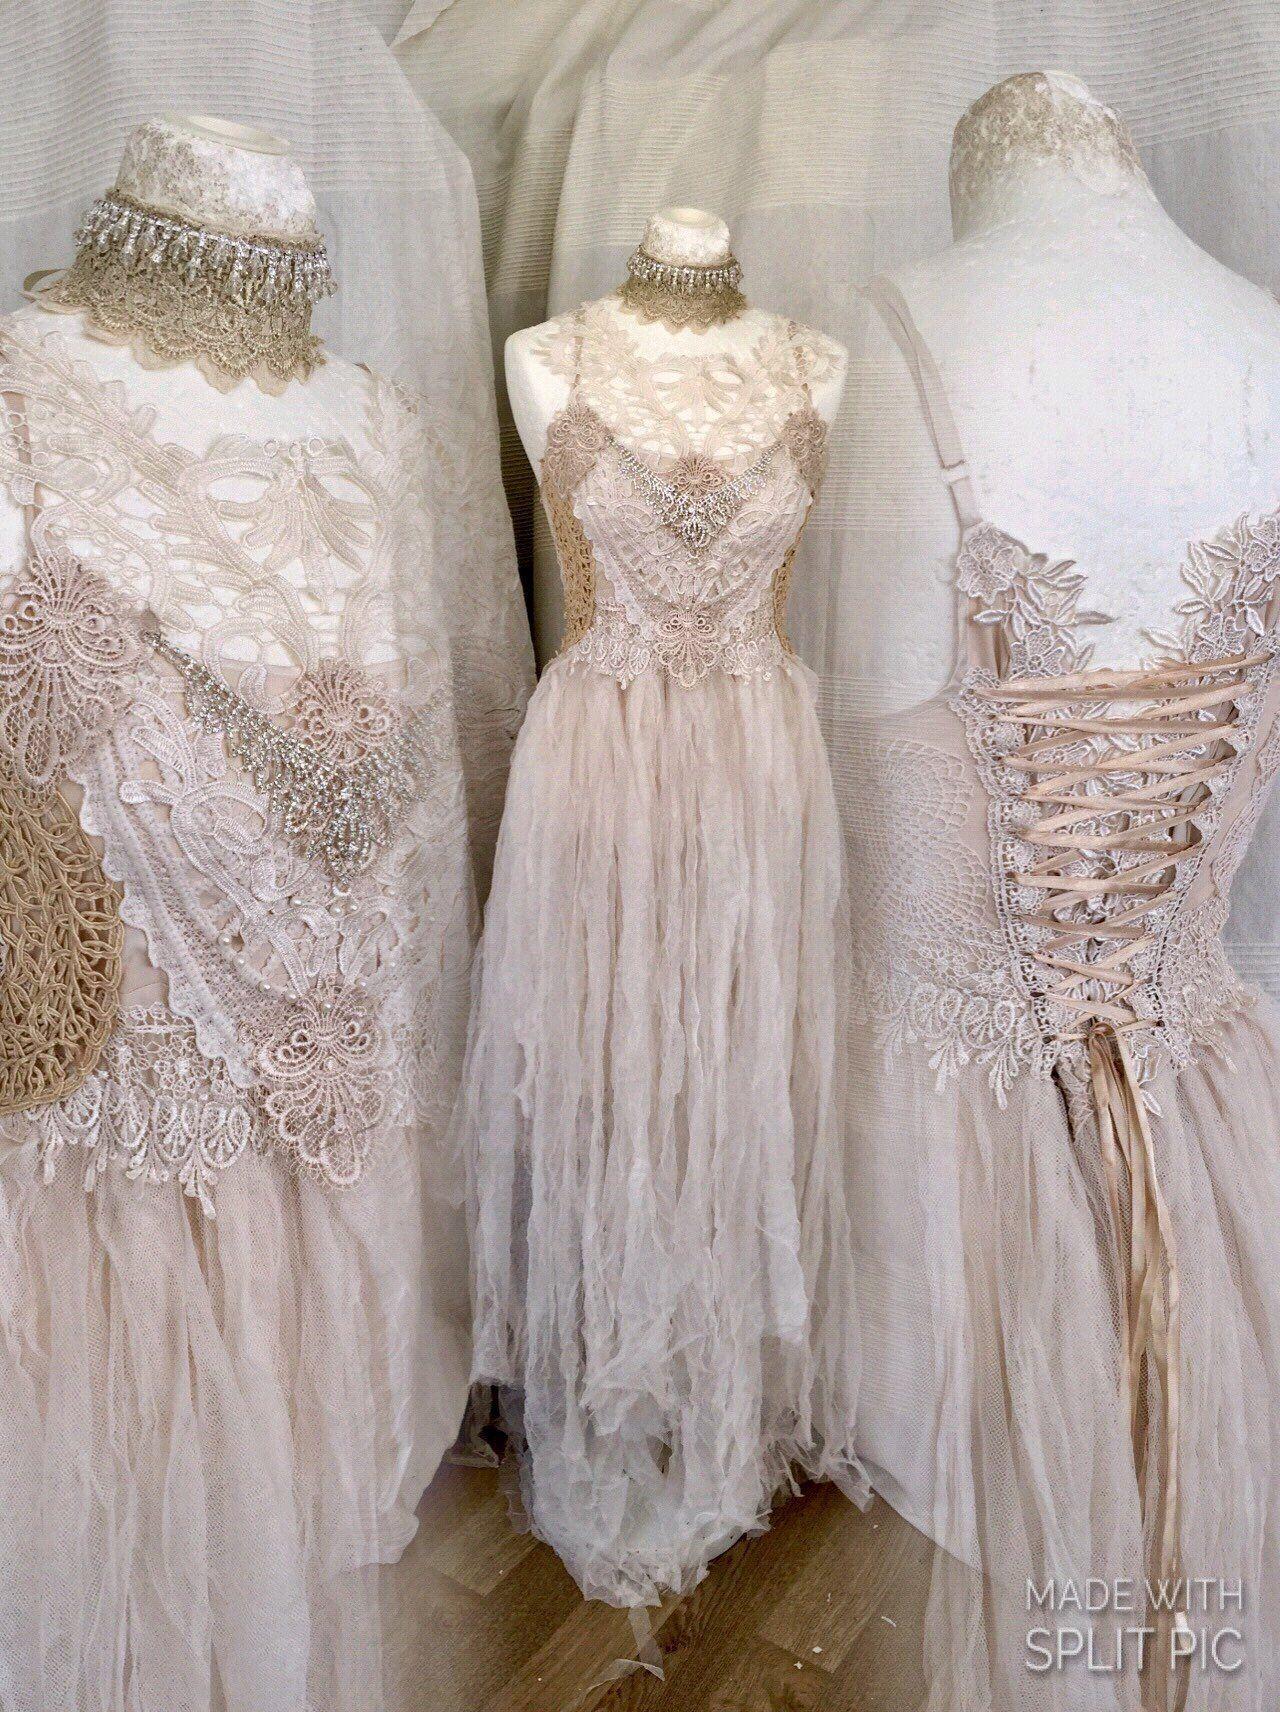 16 Darling Wedding Dresses Ball Gown Organza Ideas In 2019